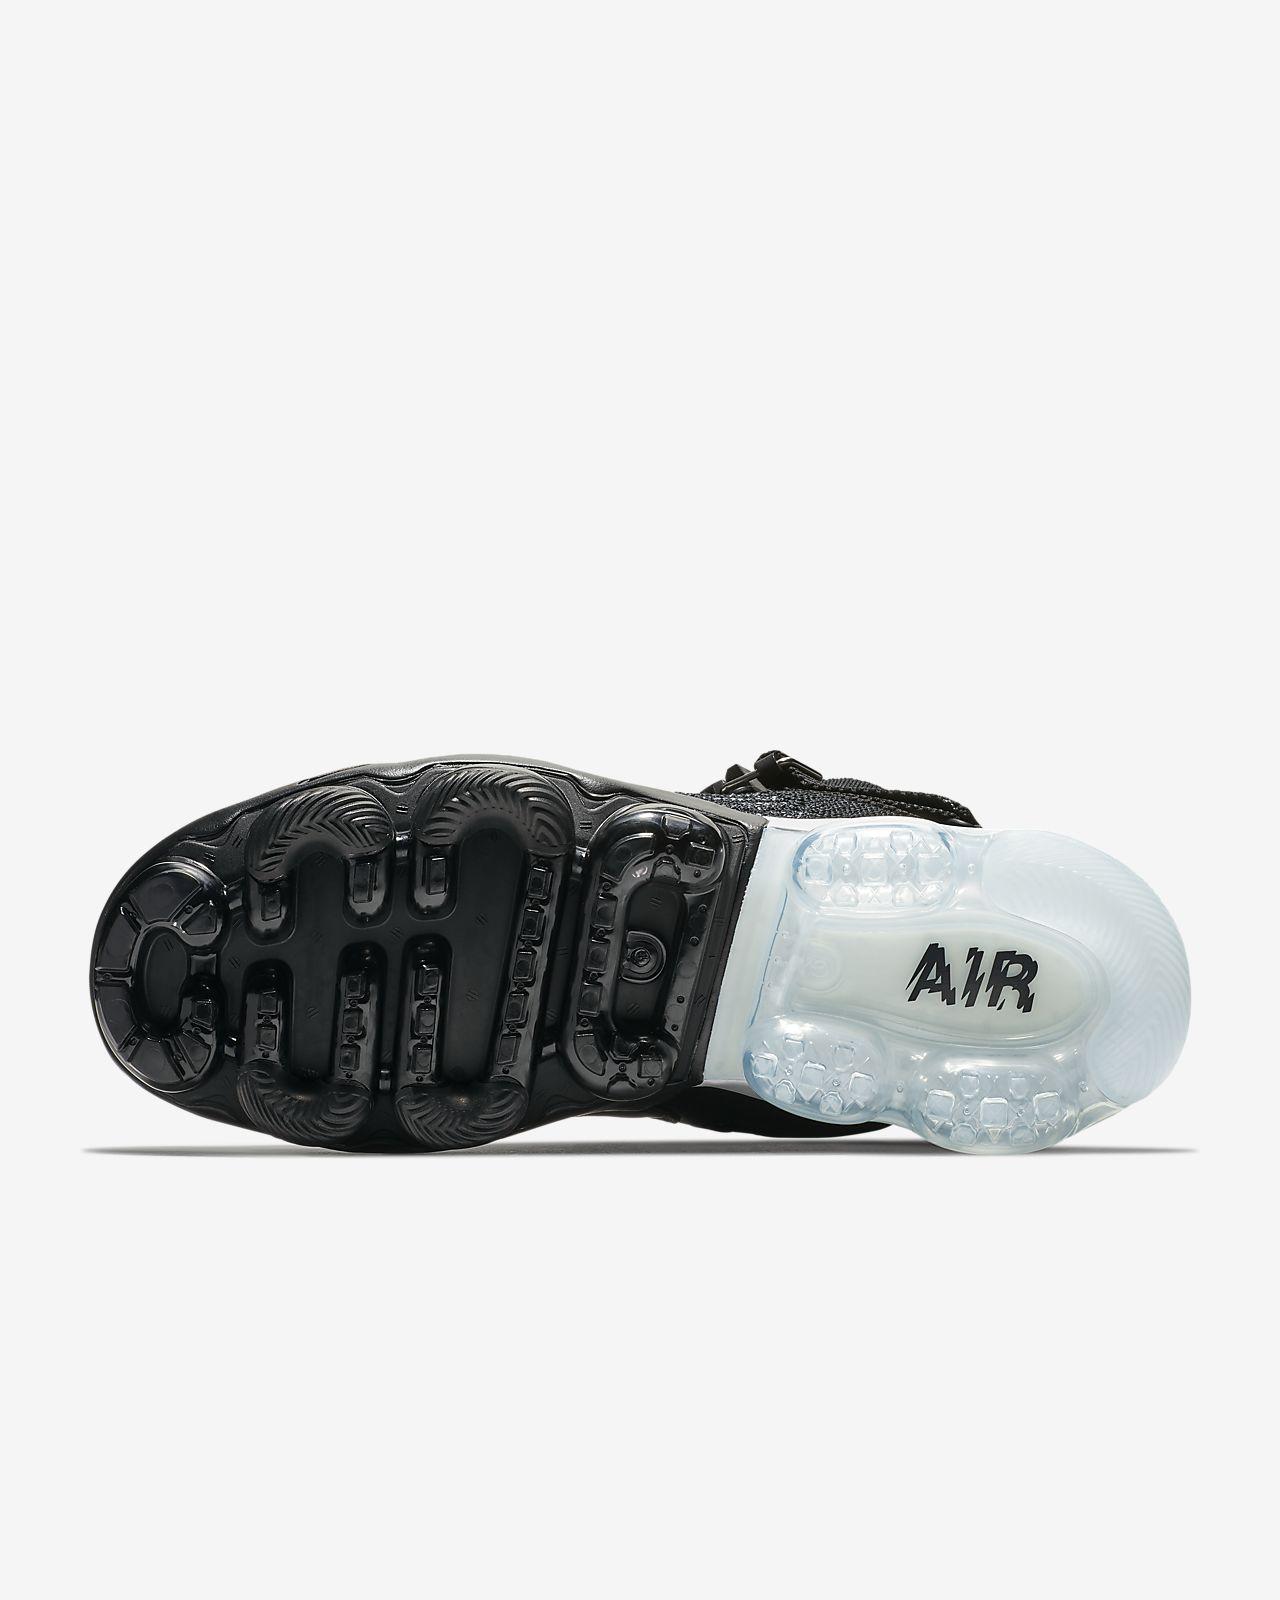 59ffb947be2e8 Chaussure Nike Air VaporMax Premier Flyknit pour Homme. Nike.com FR